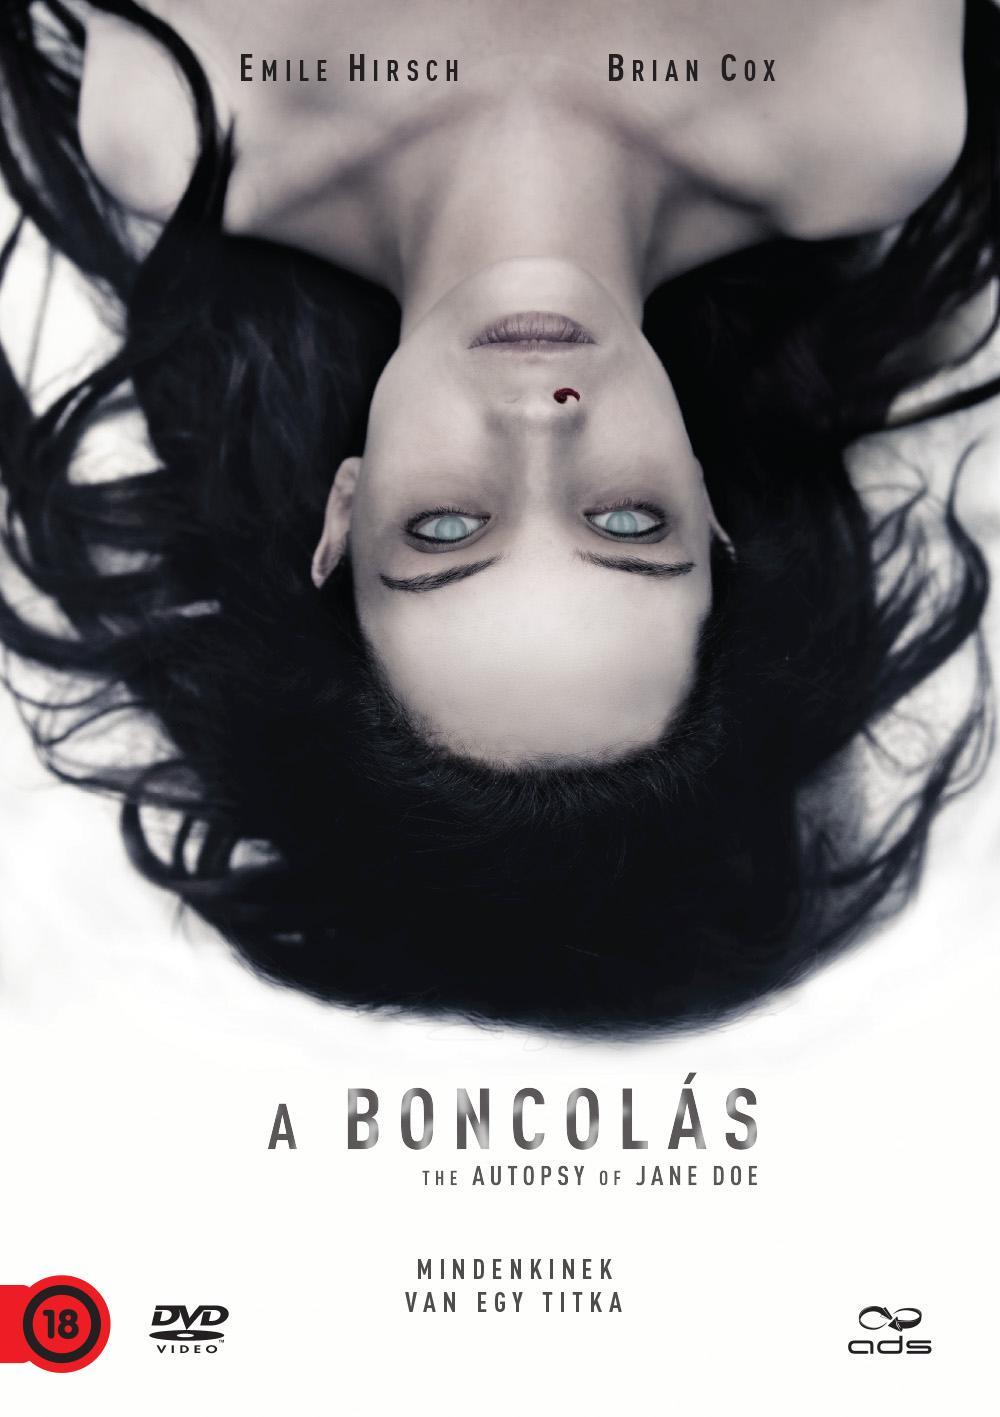 ANDRÉ OVREDAL - A BONCOLÁS - DVD -